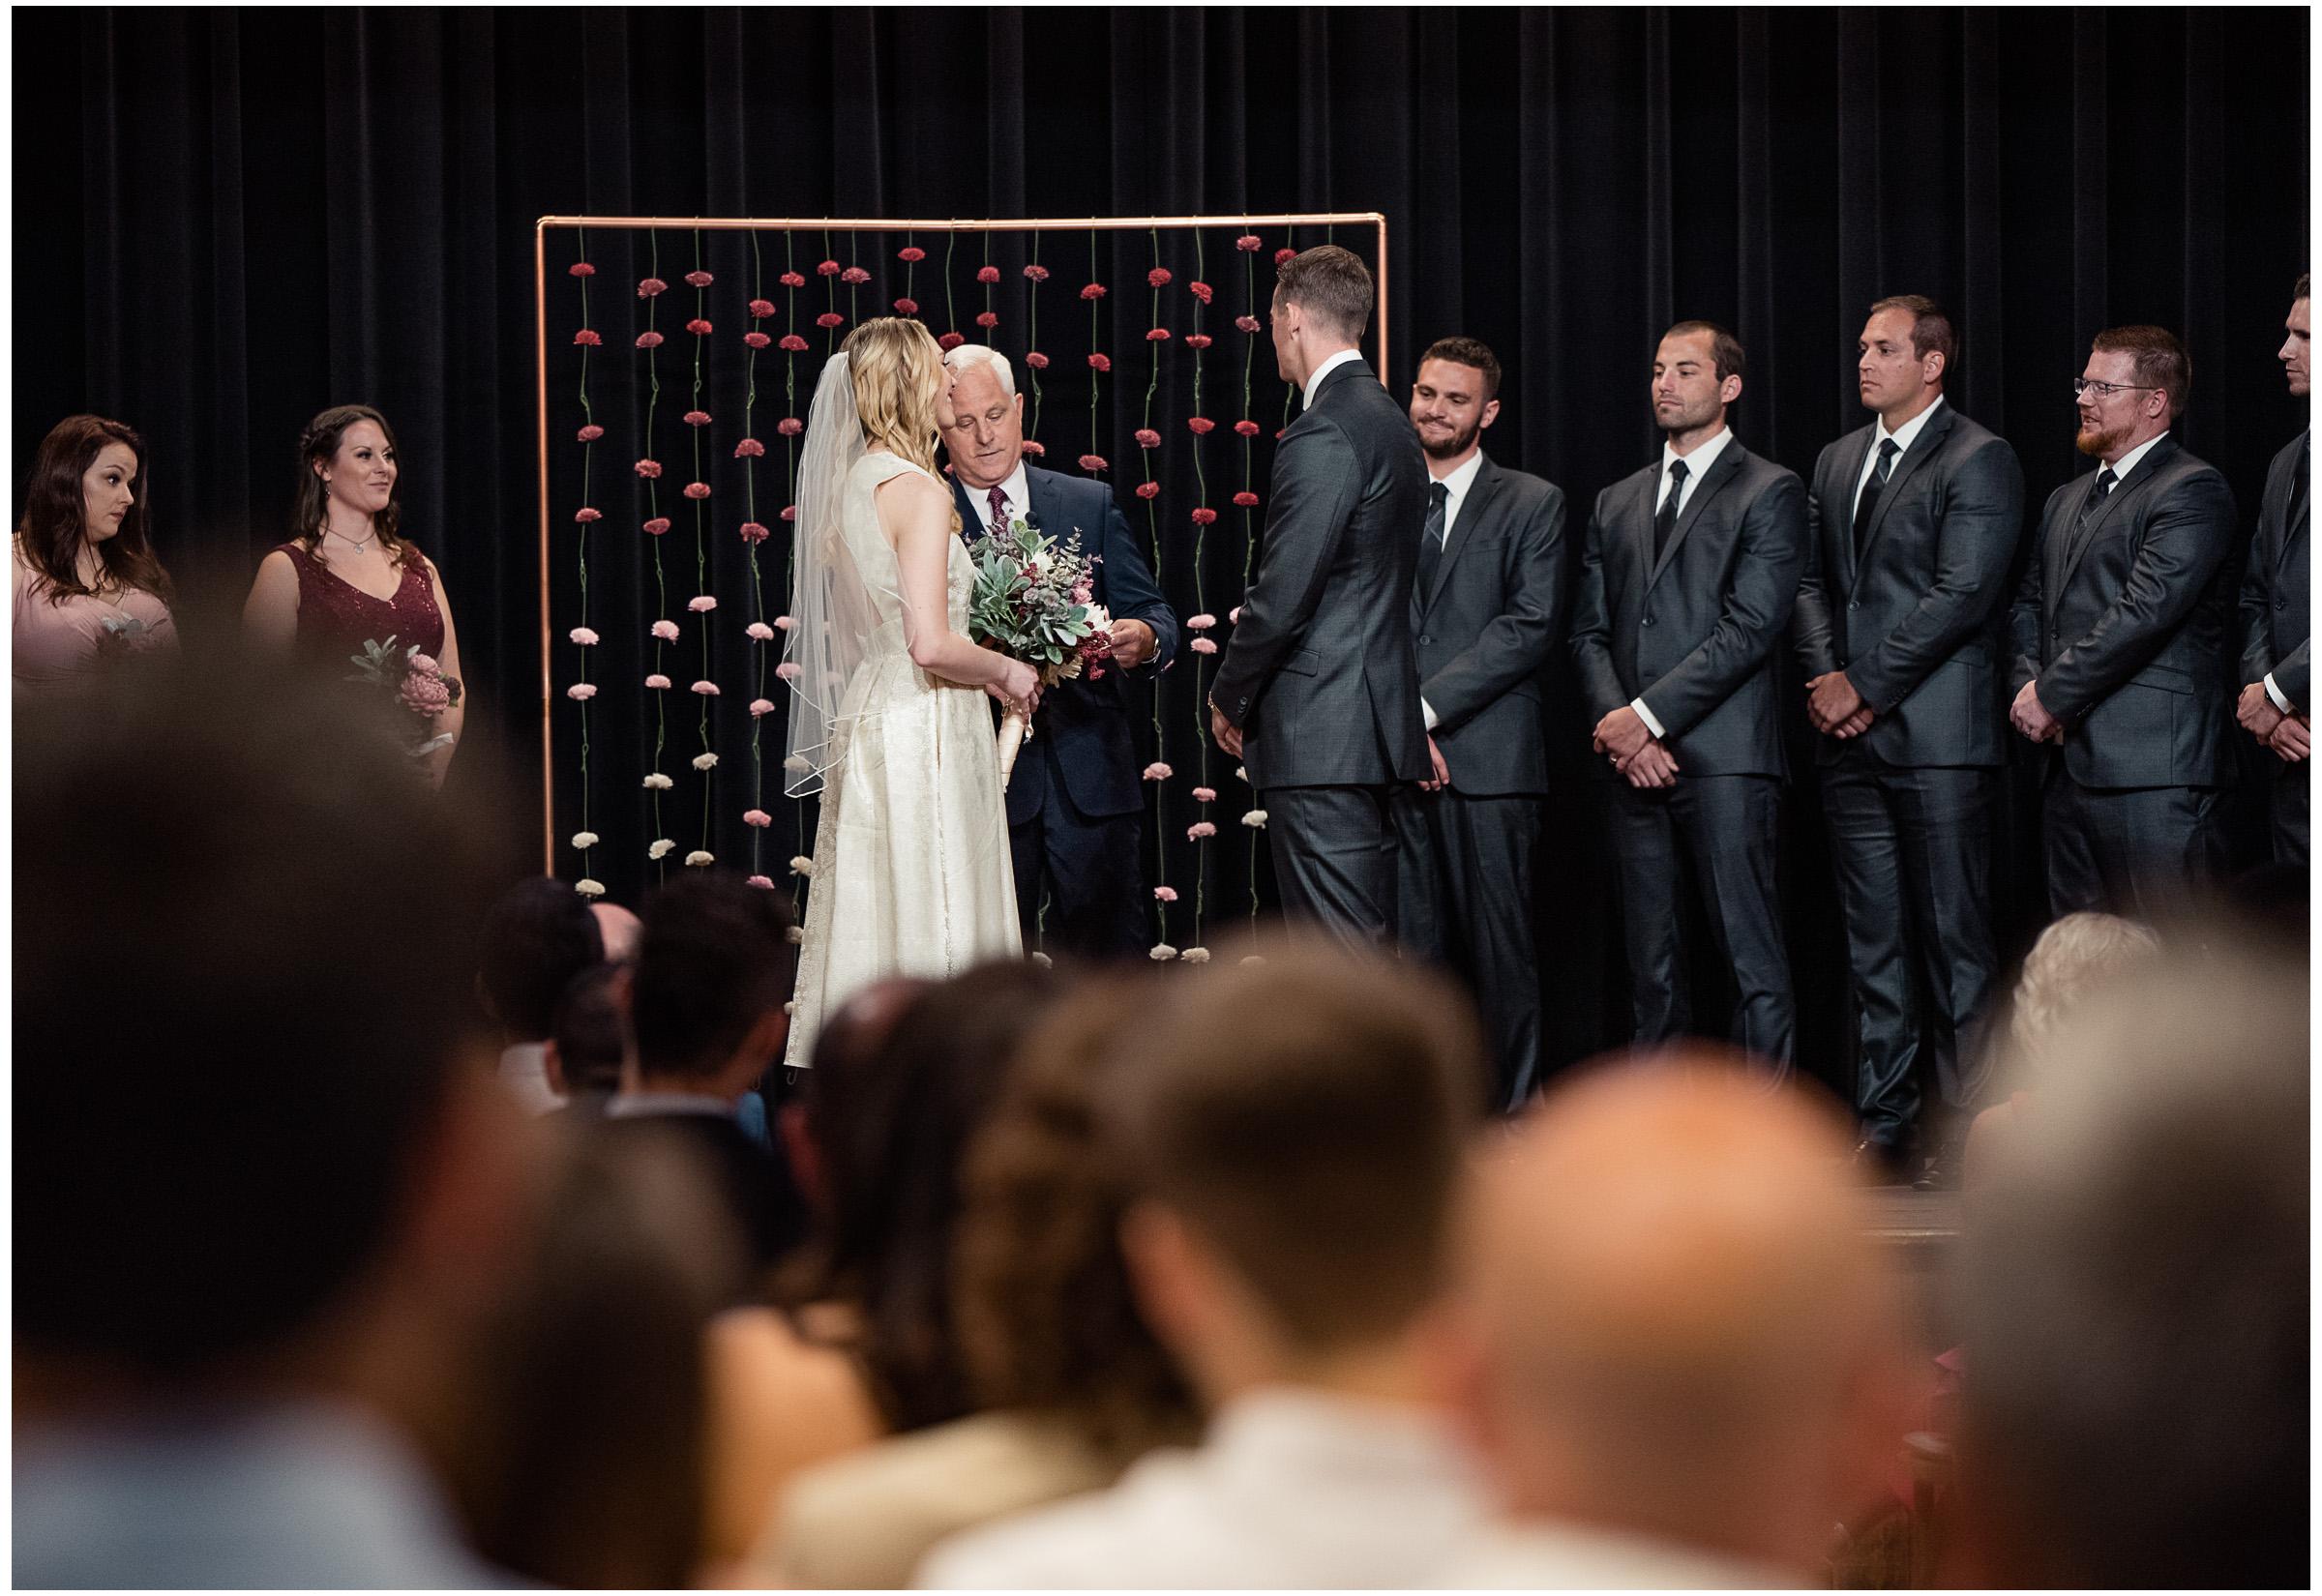 Loomis Wedding - Sacramento Photographer - Blue Goose - Justin Wilcox Photography - 12.jpg